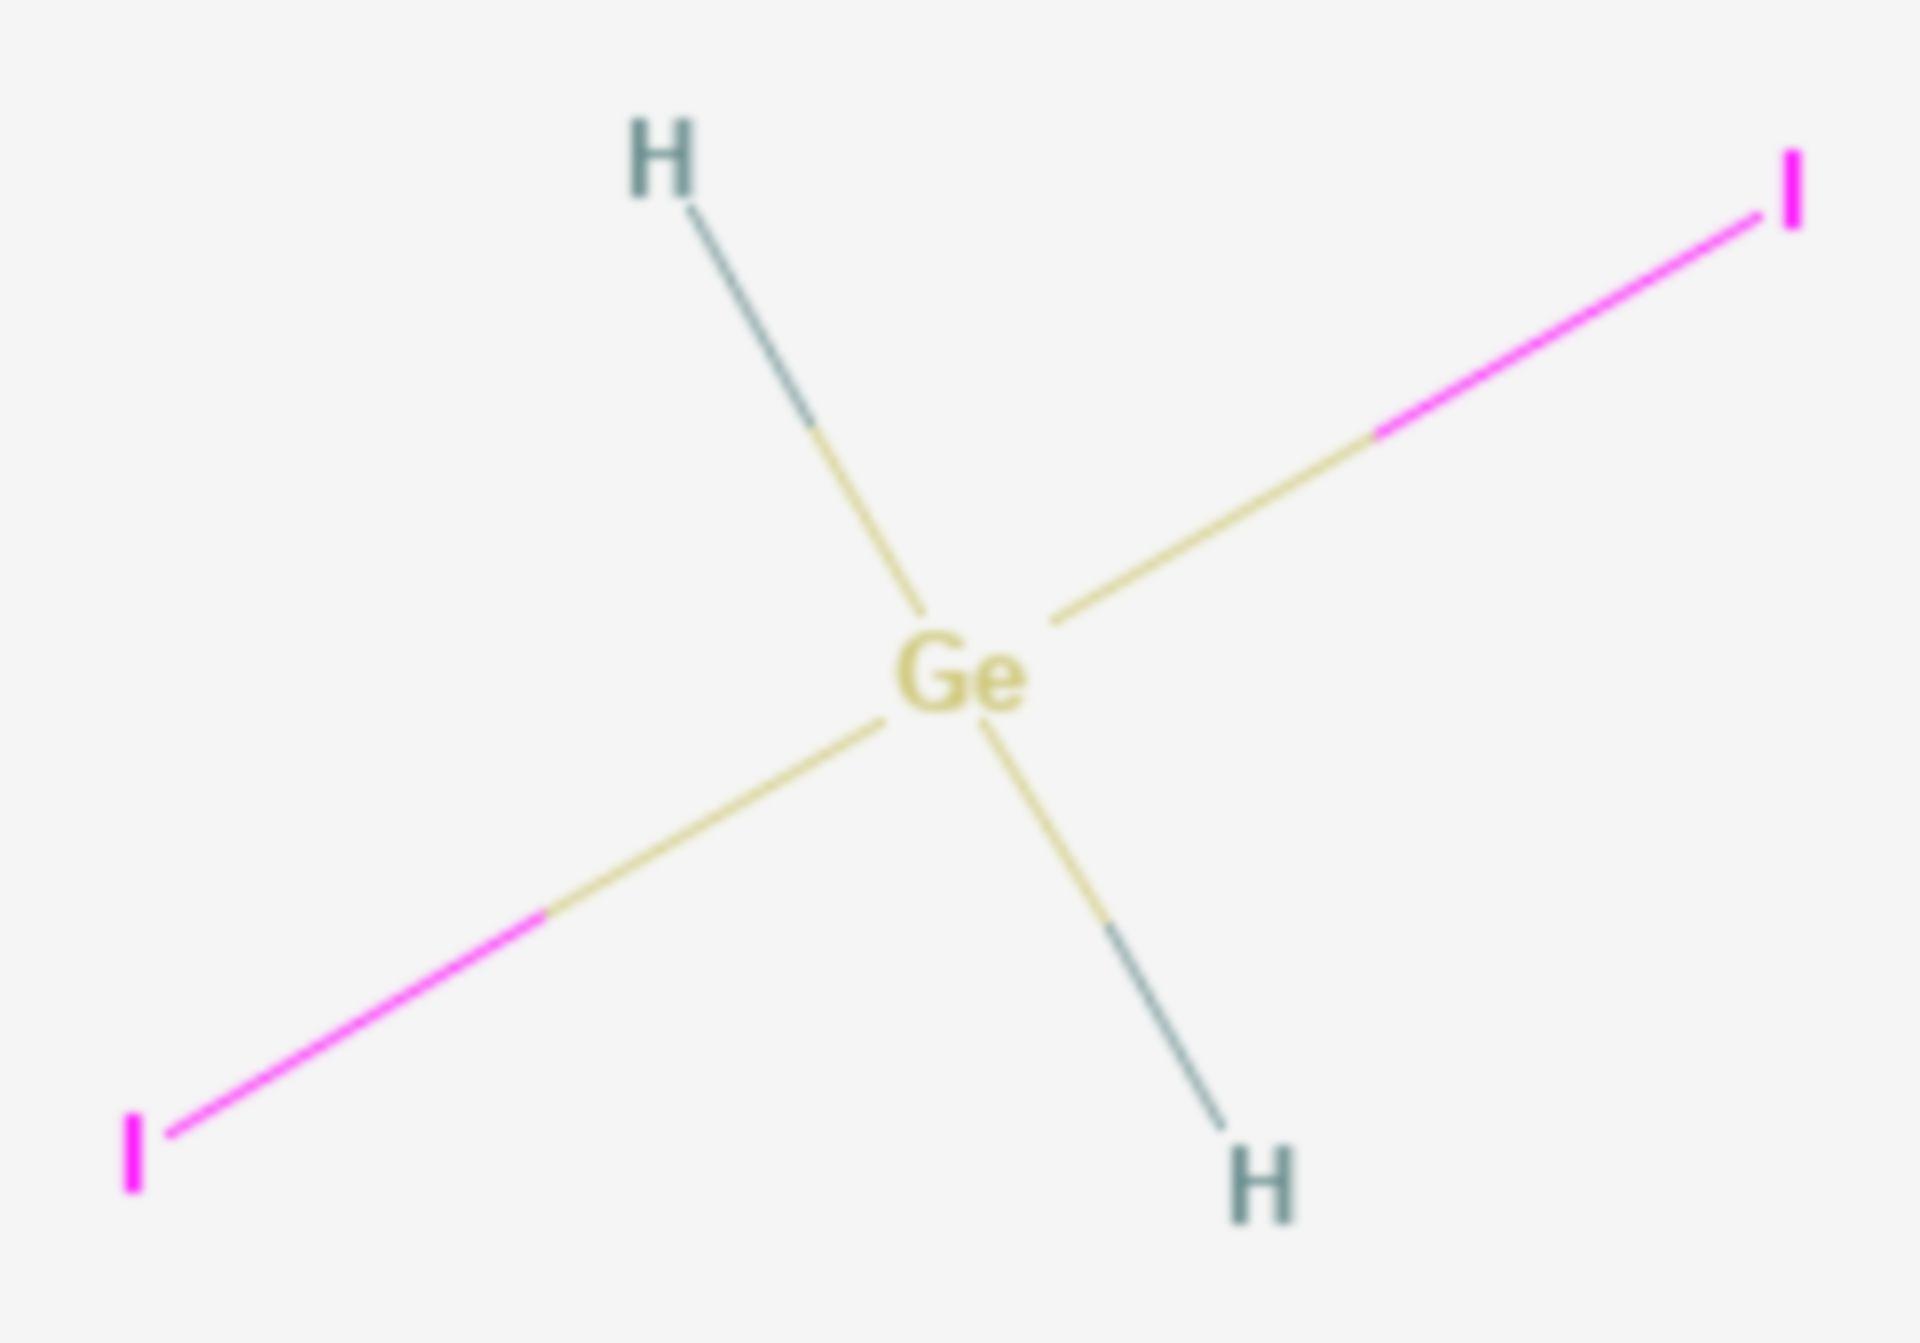 Diiodgerman (Strukturformel)